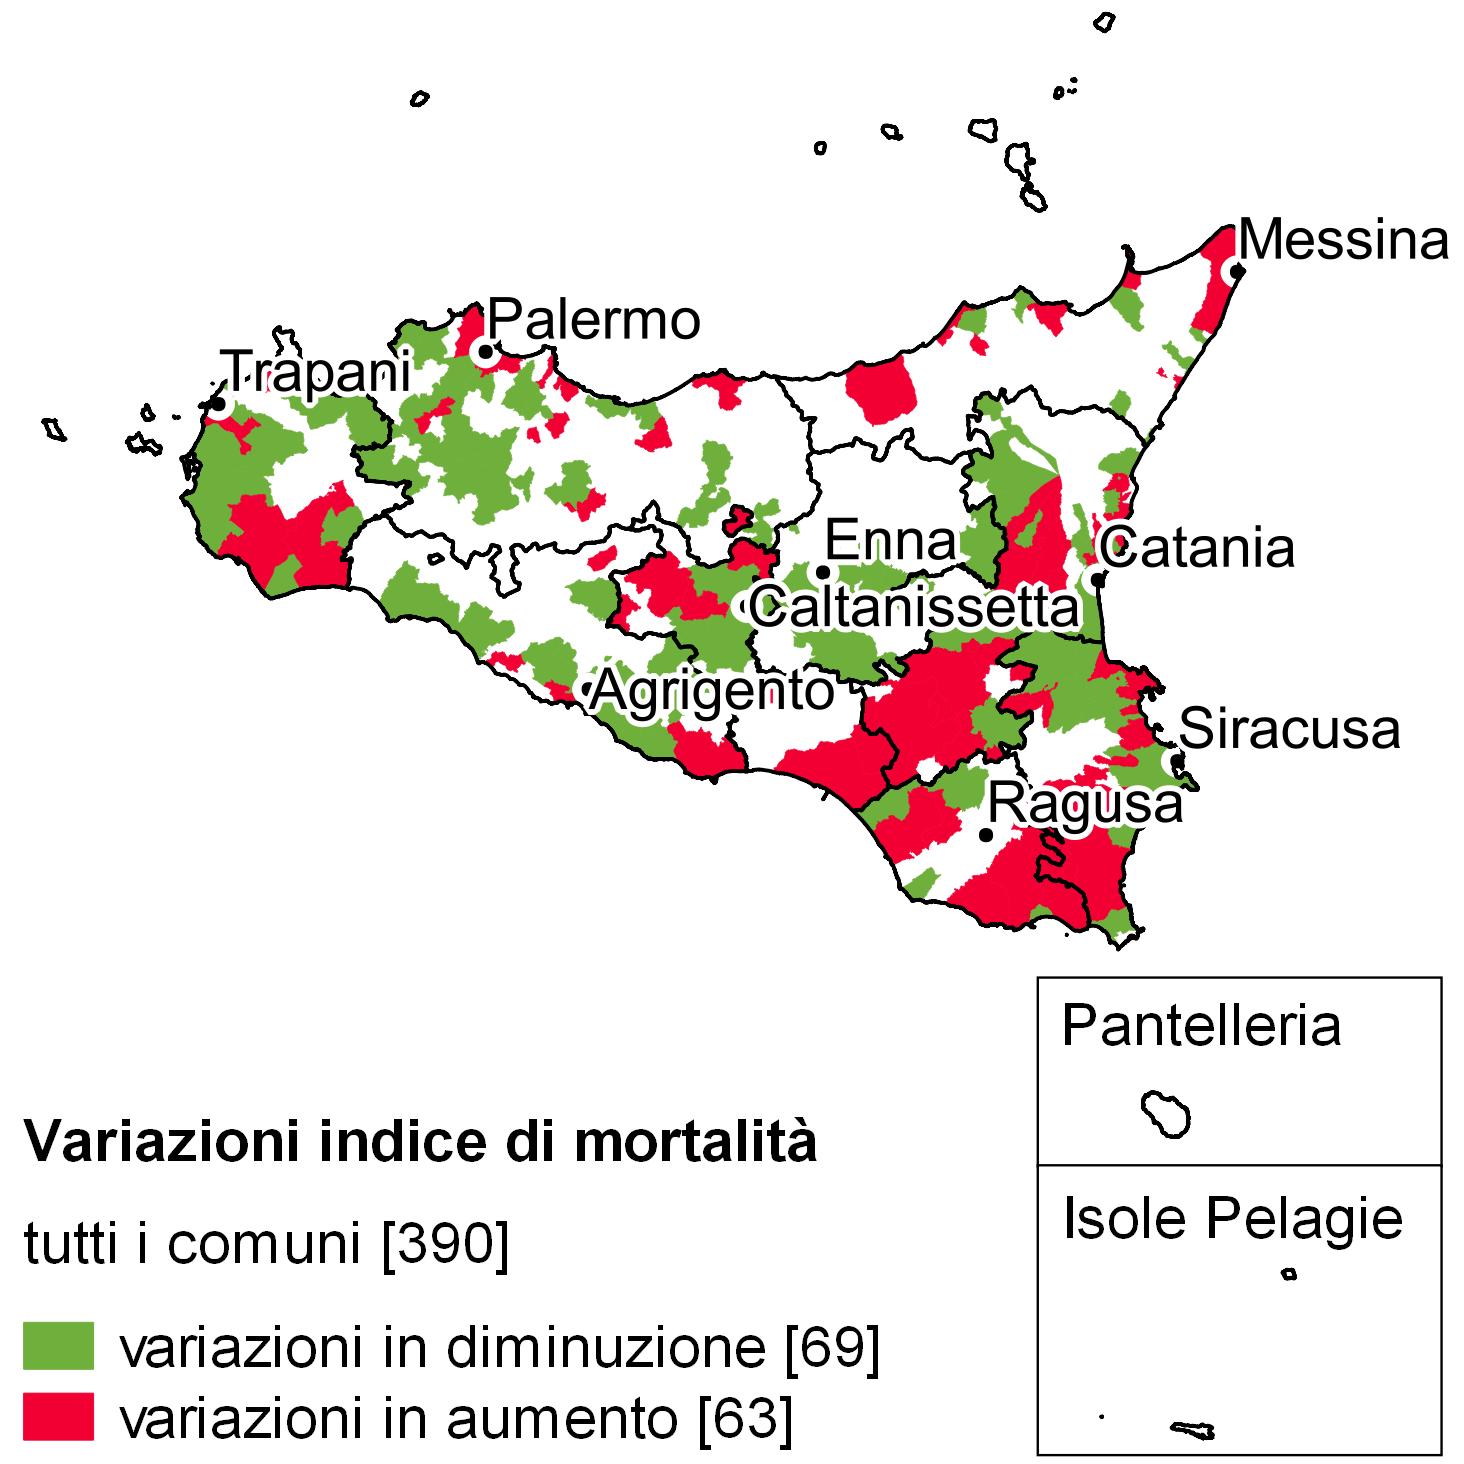 dati epidemiologici sicilia carcinoma prostatico 2020 2